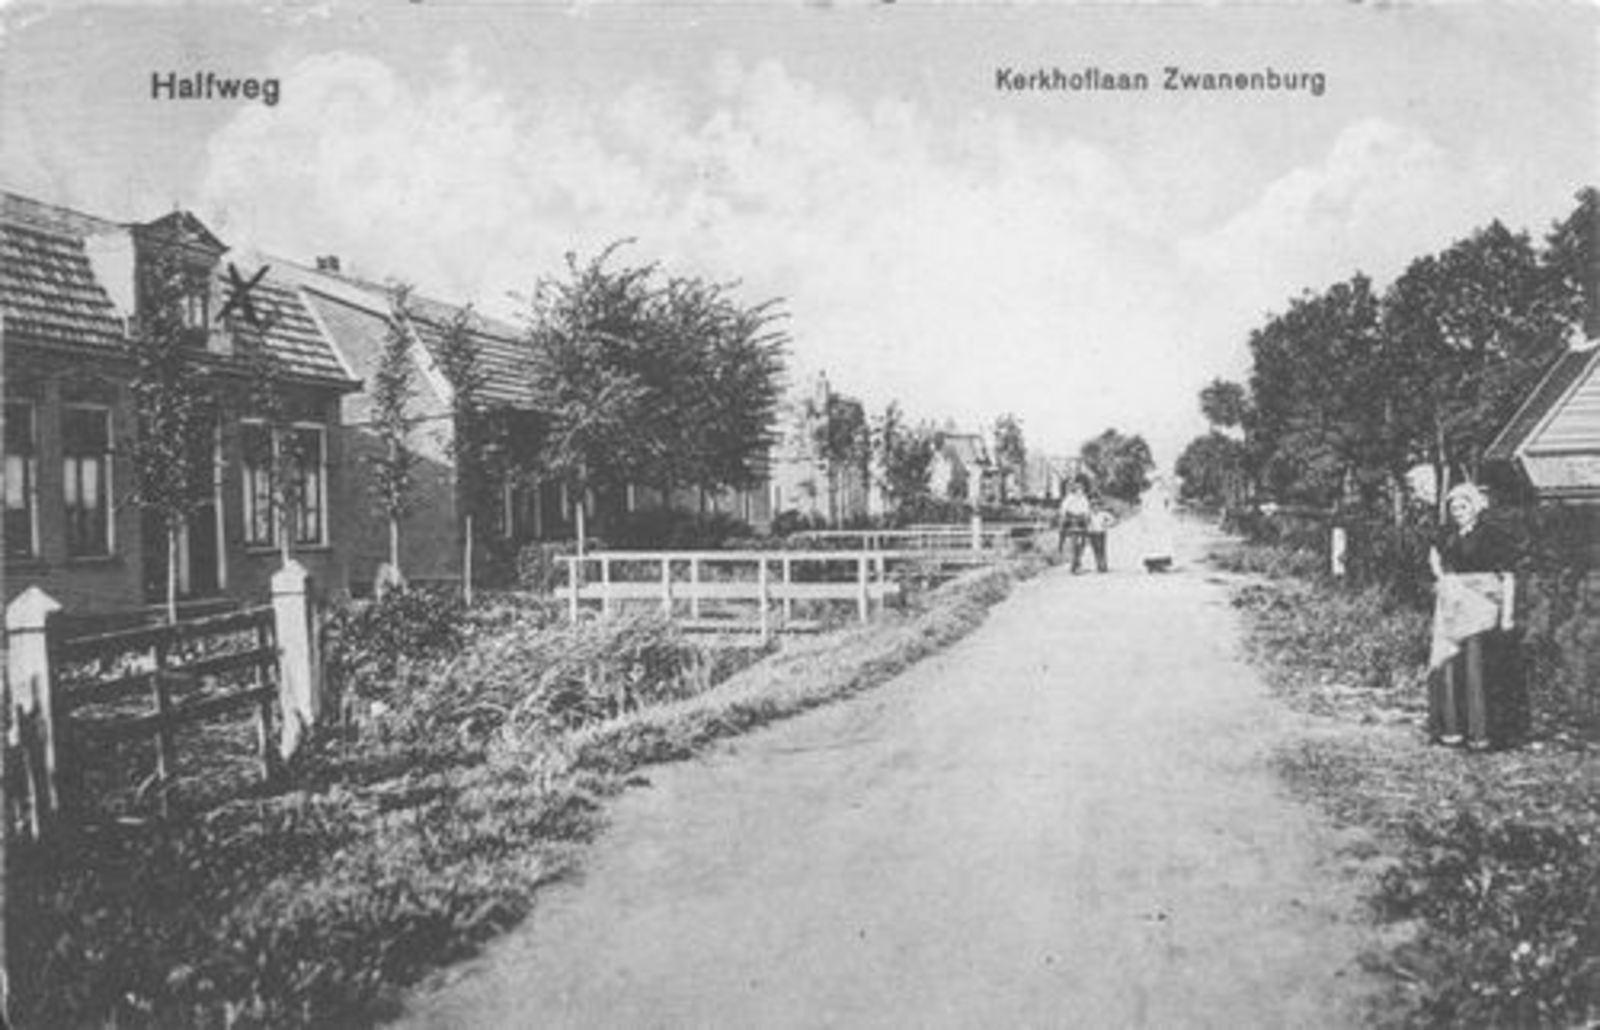 Kerkhoflaan W 0065- 1916 tussen Olmenlaan en Wilgenlaan_3